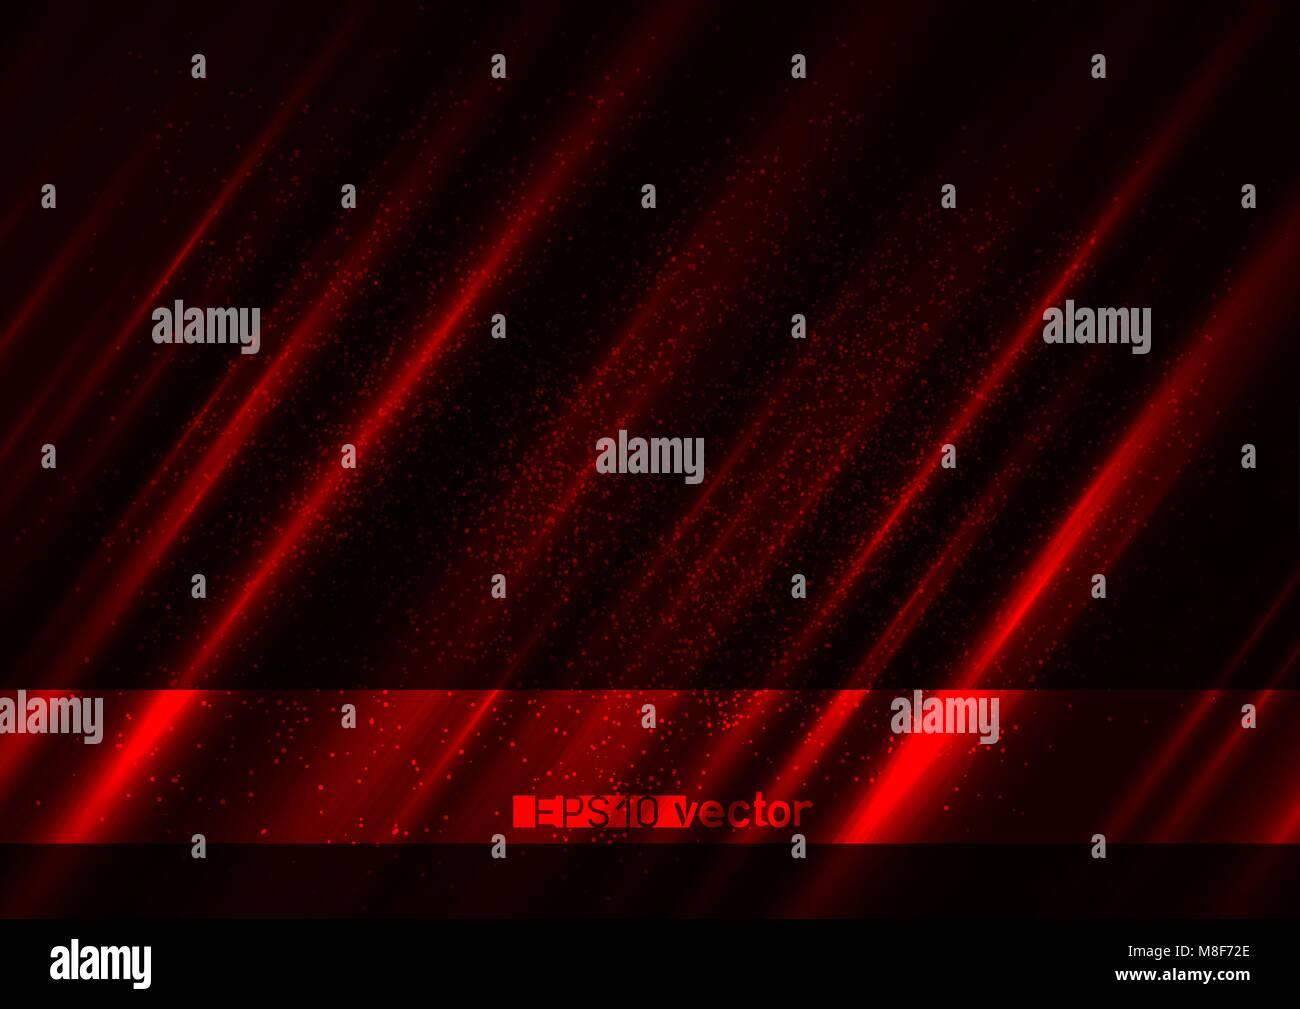 Blood Blotter Bright Light Red Conflict Background Medicine Hematic Blot Blurred Maroon Wallpaper